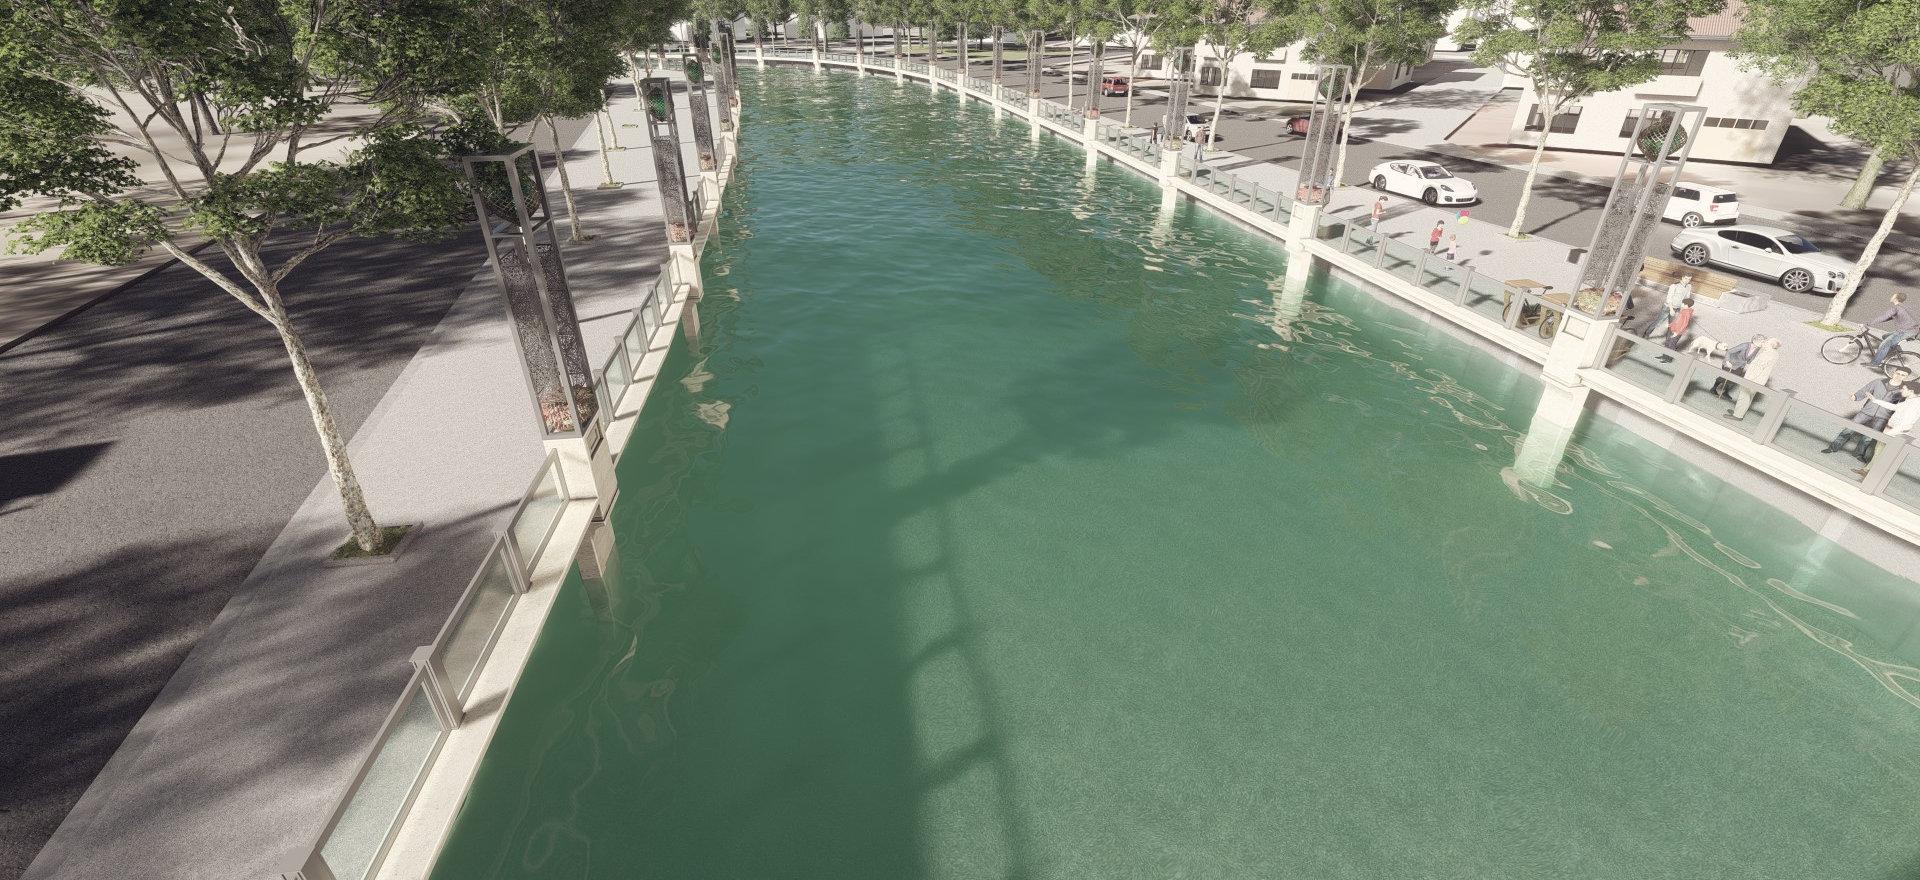 Duzce Asar Stream